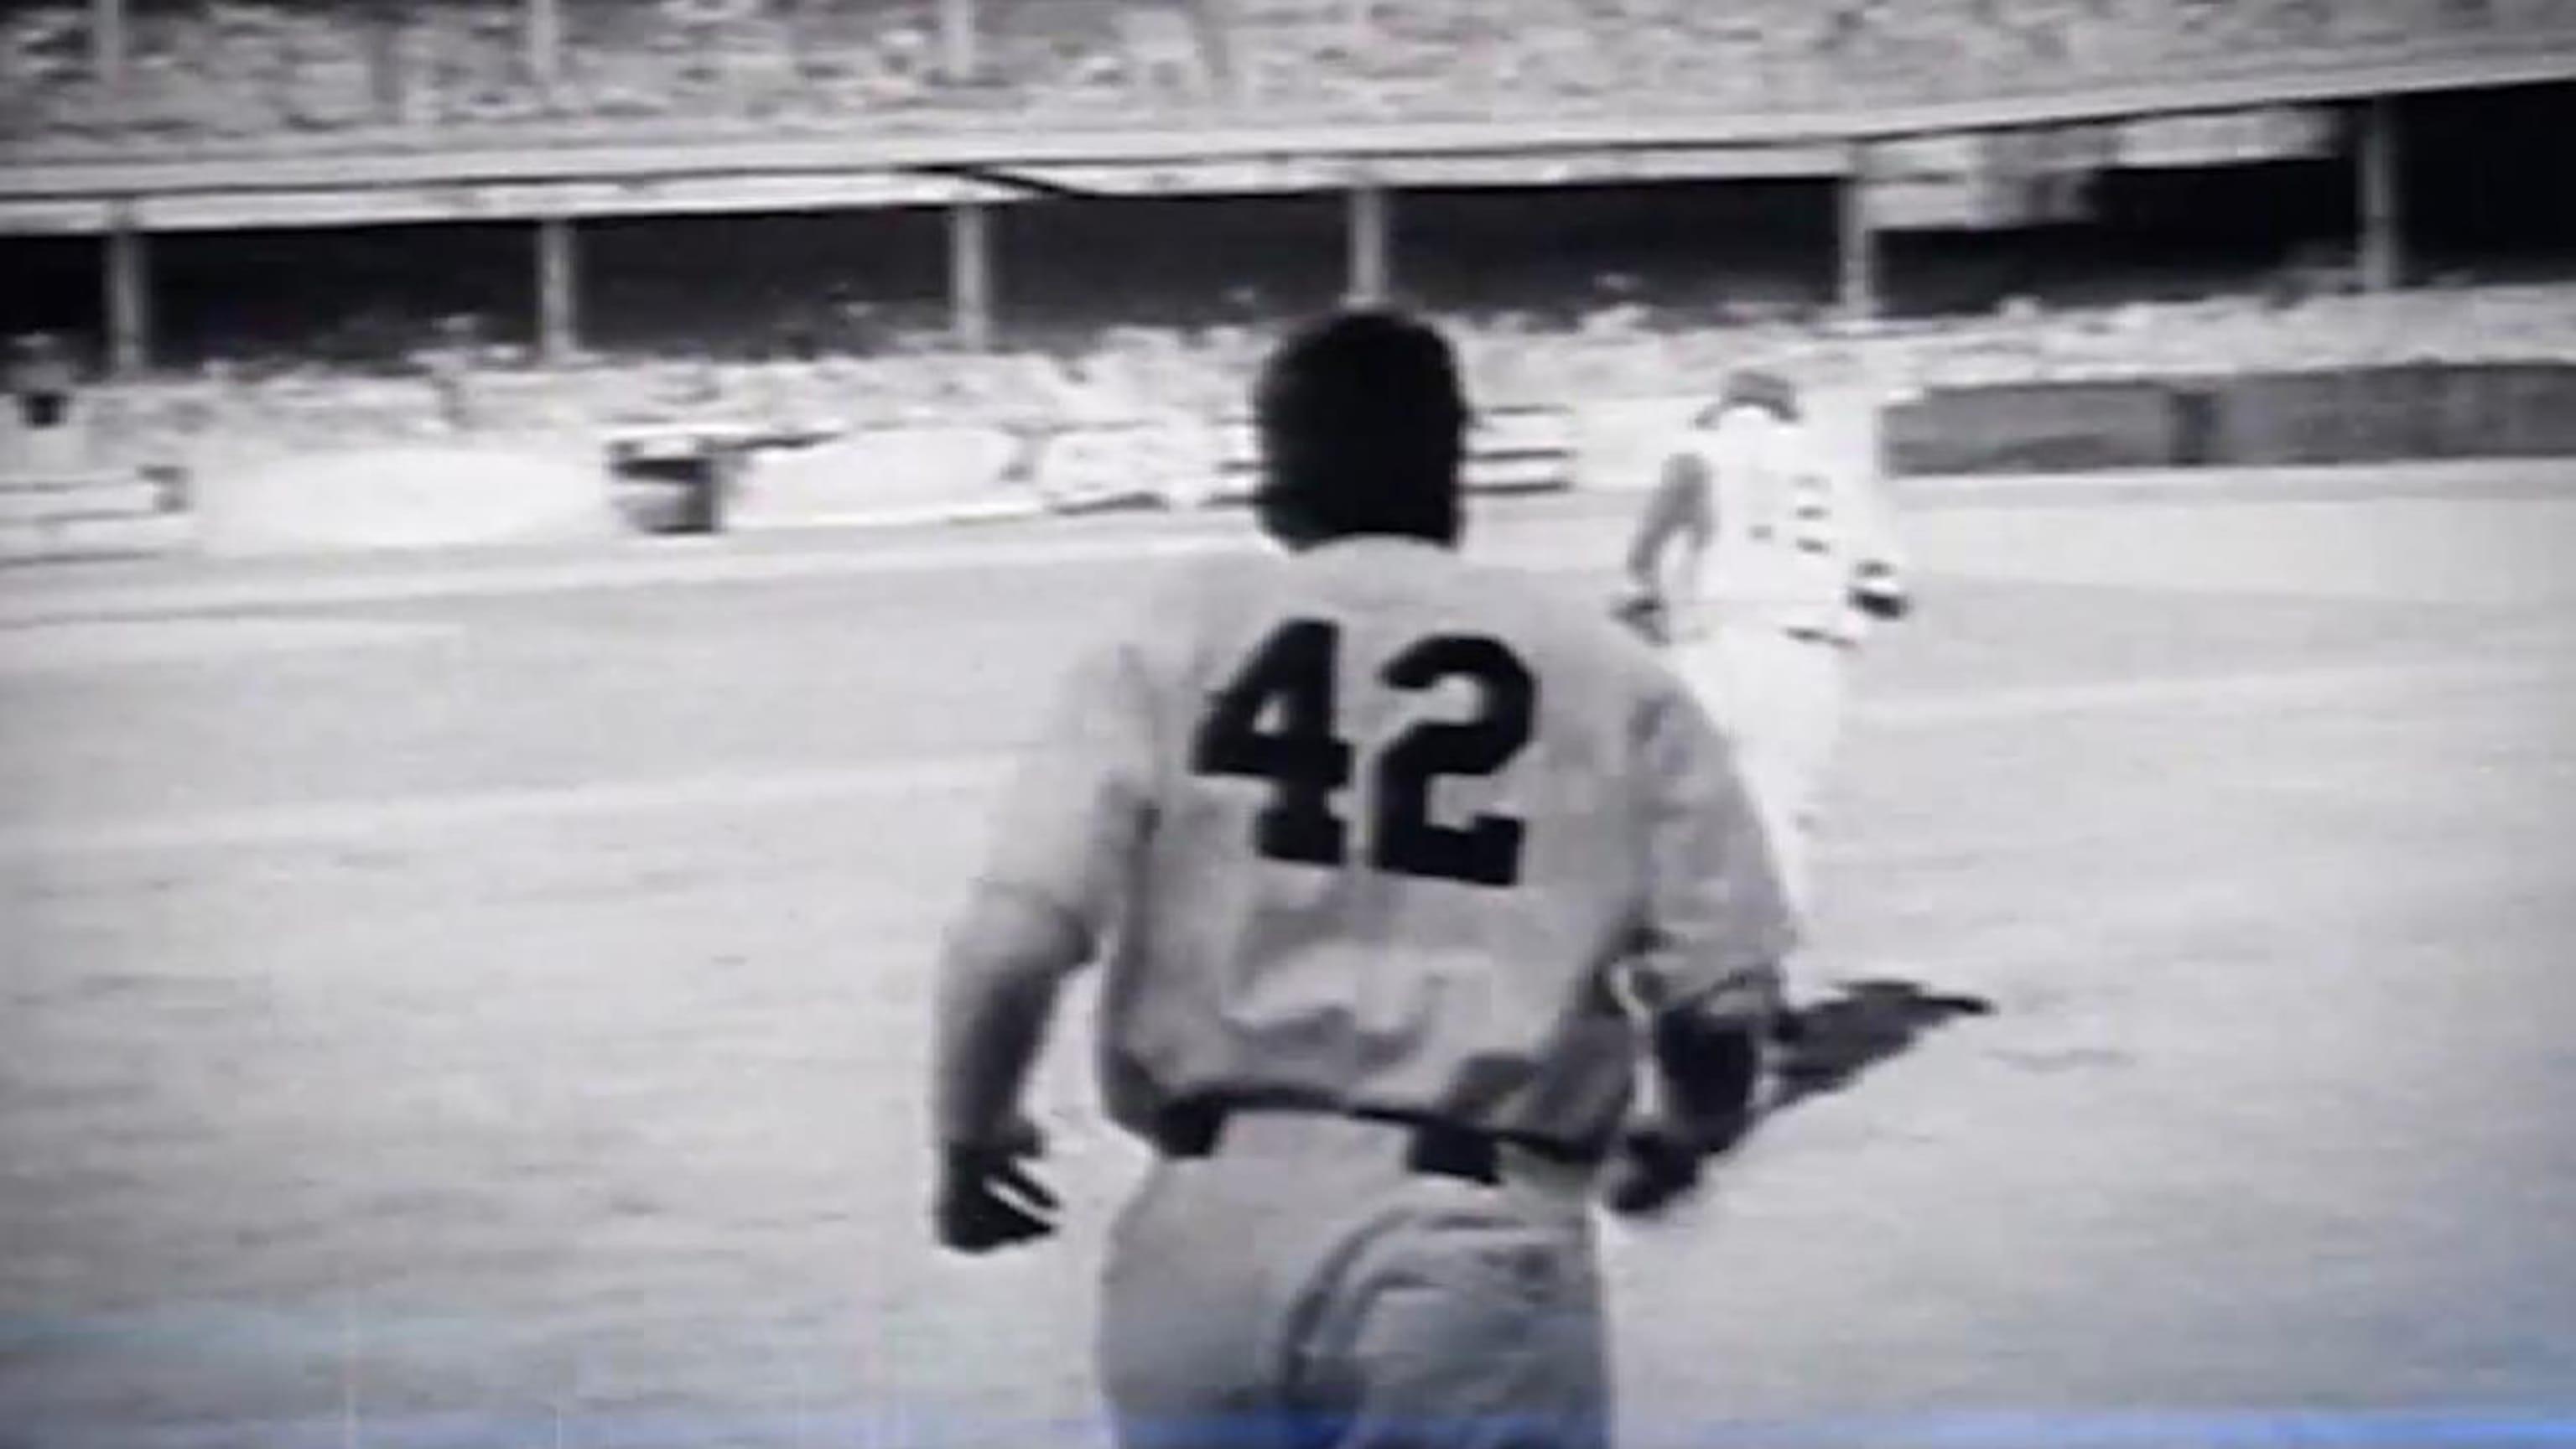 Jackie Robinson LA Dodgers New Arrivals Legend Baseball Player Jersey